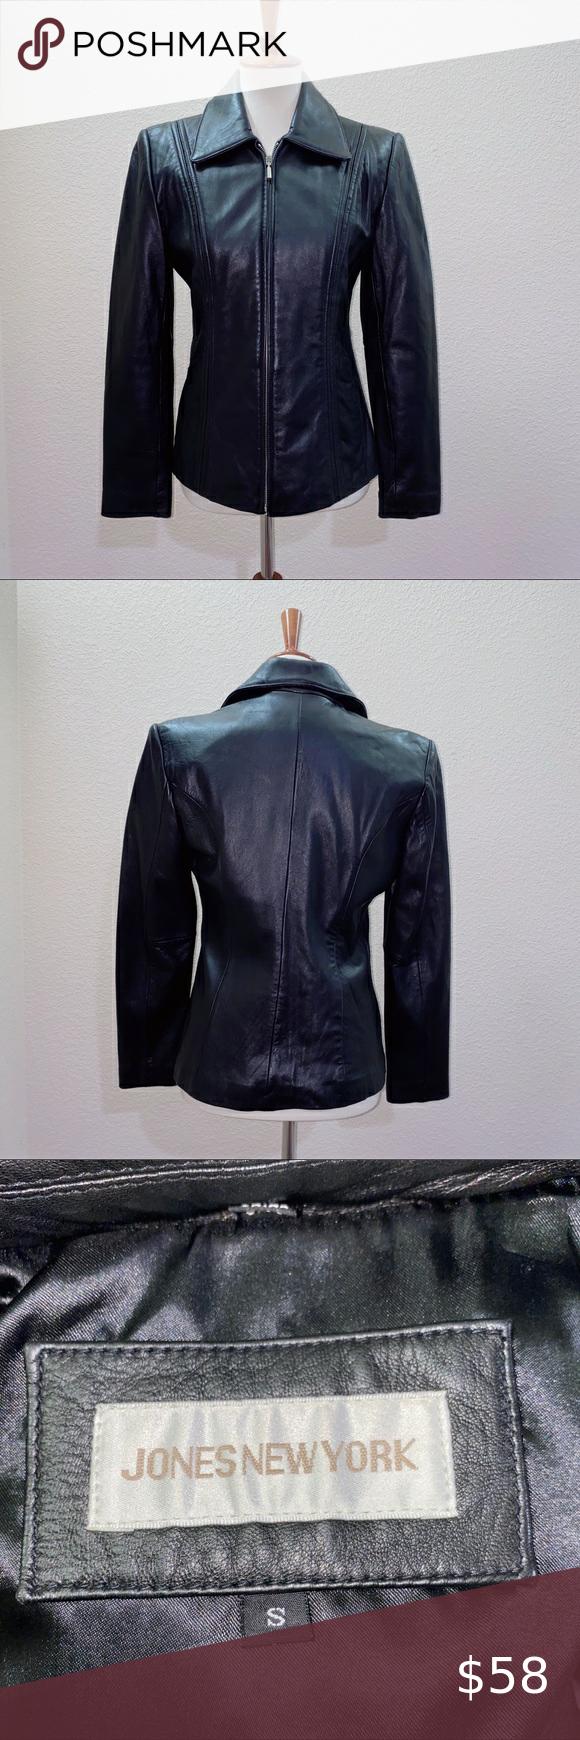 Nwot Jones New York Leather Jacket Size Small Leather Jacket Jones New York Jackets [ 1740 x 580 Pixel ]